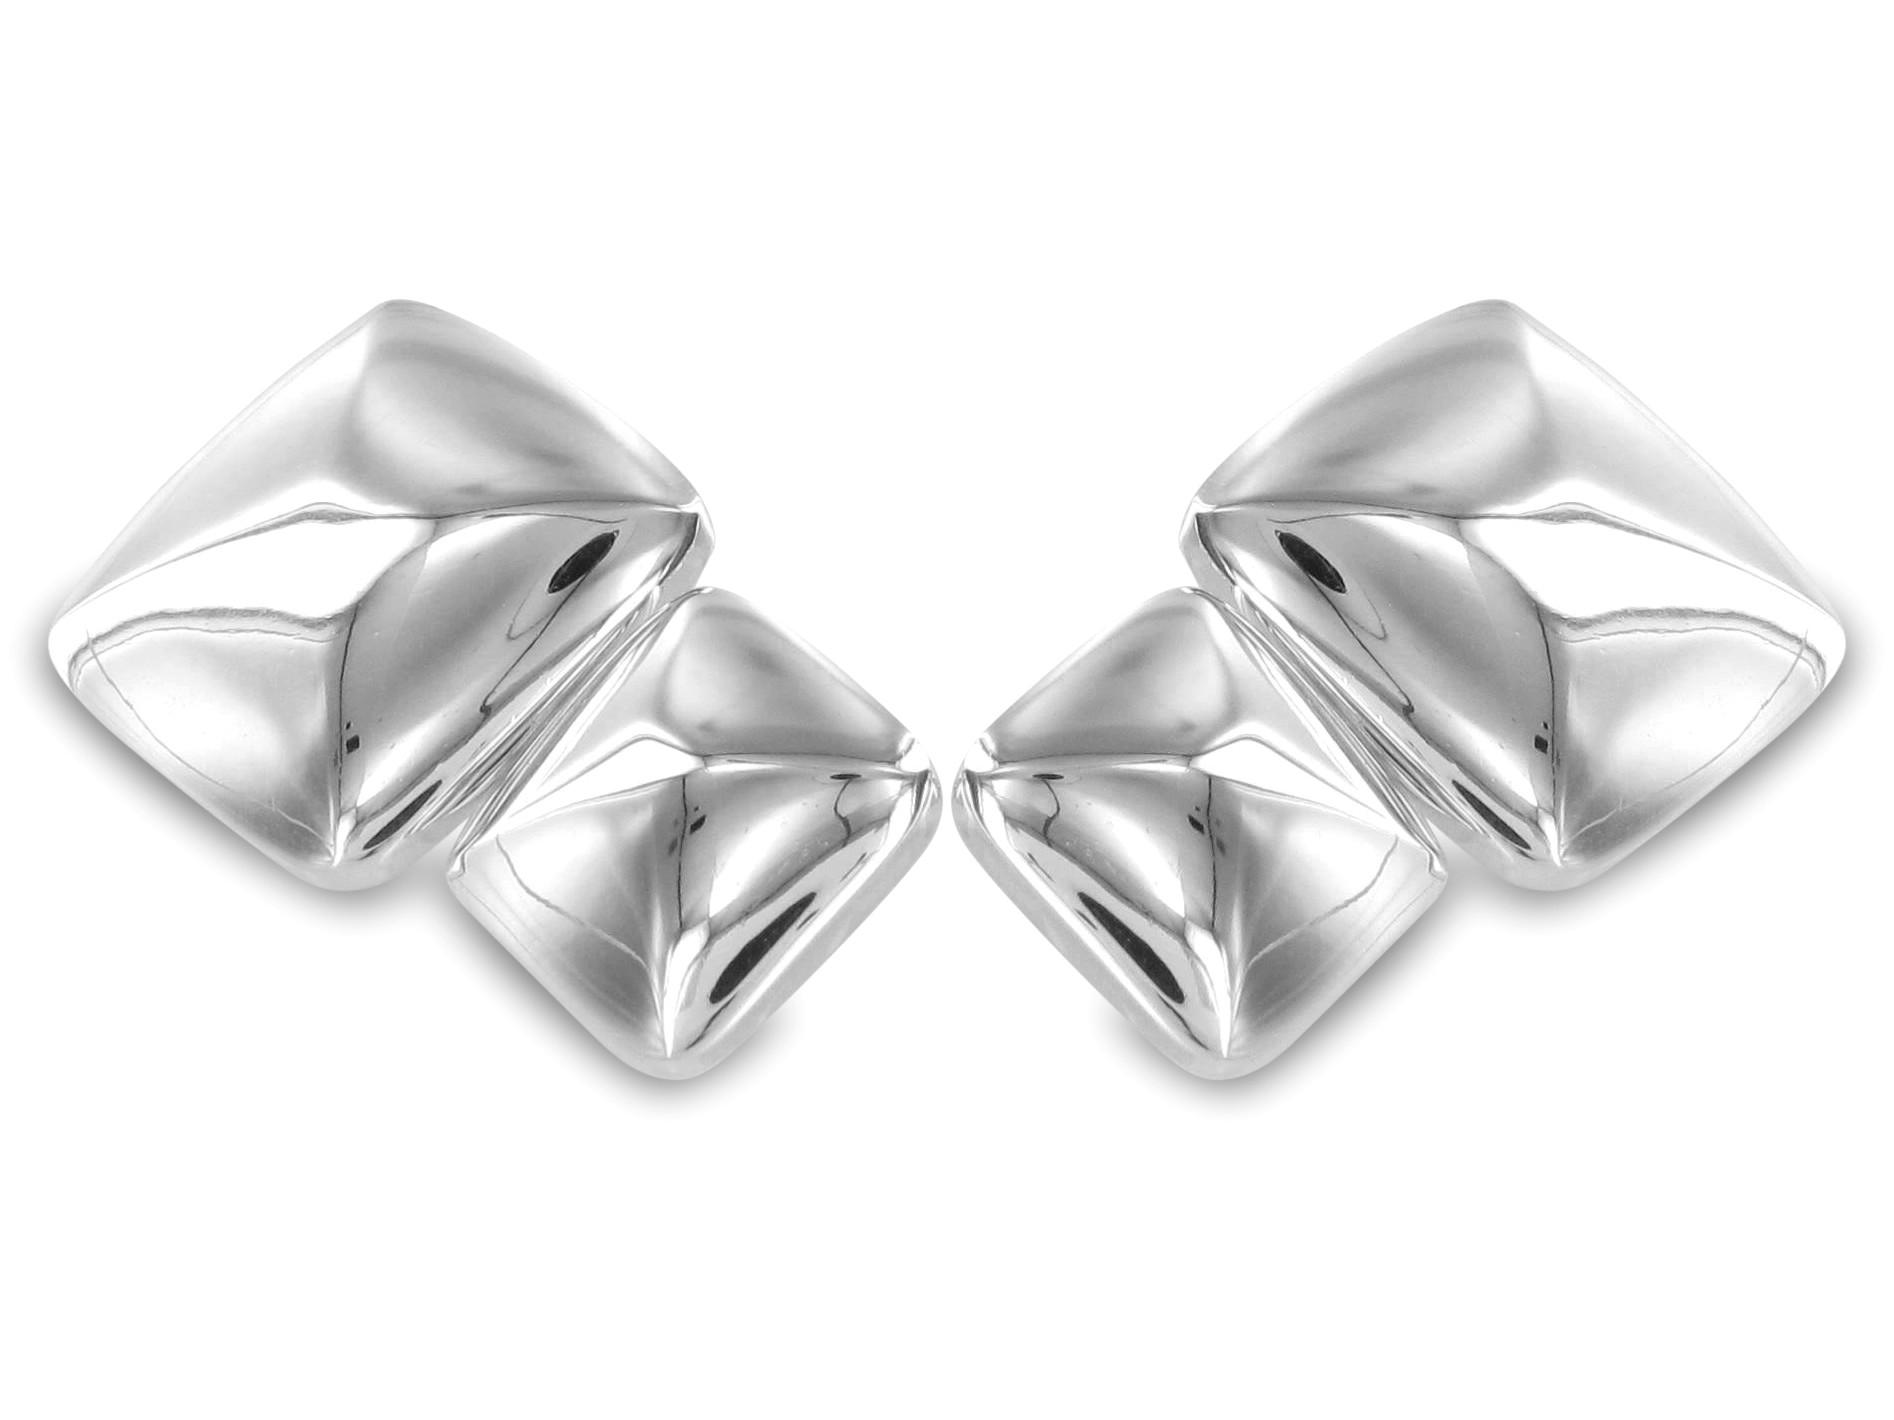 BROOKER Manschettenknöpfe Silber